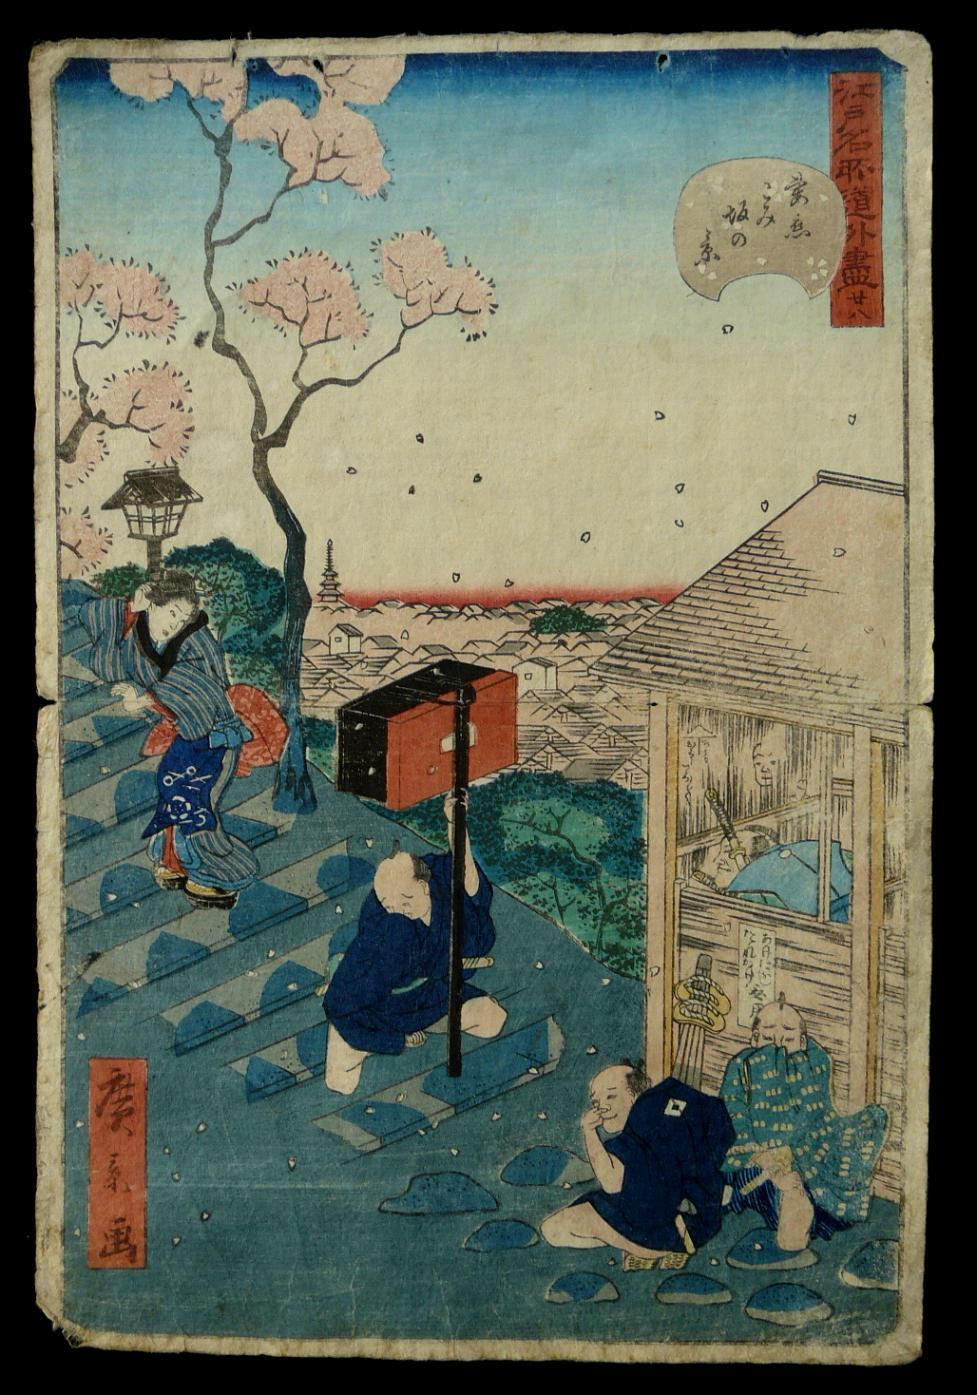 UTAGAWA HIROKAGE: #P2355 VIEWING TOKYO FROM THE EDO ROAD (1859)